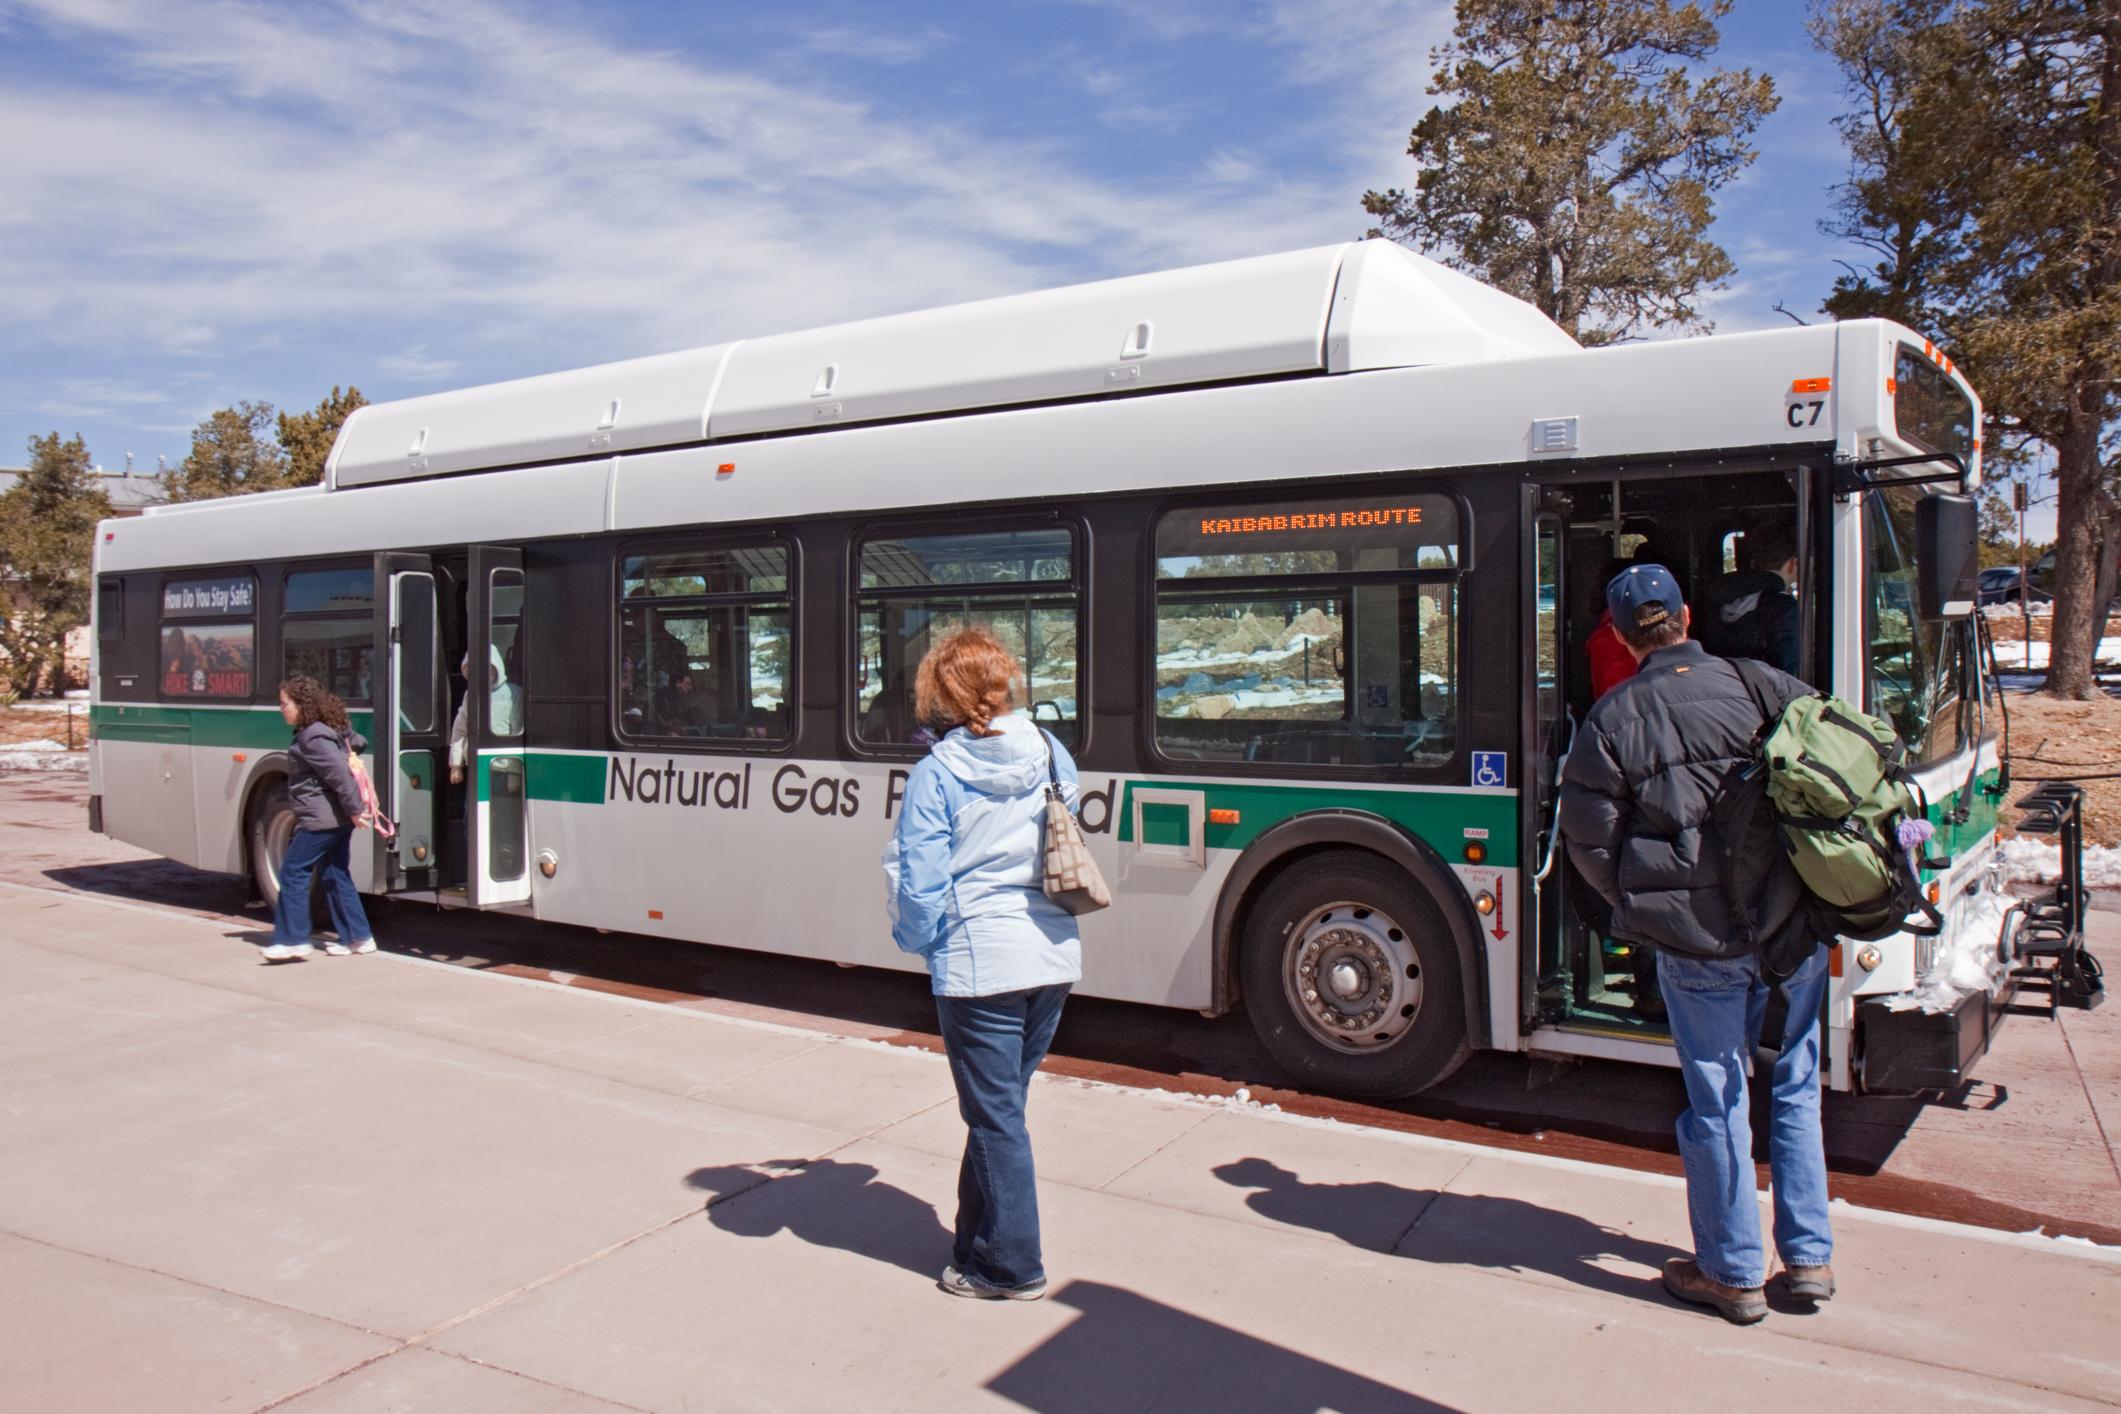 Natural gas bus picking up passengers.